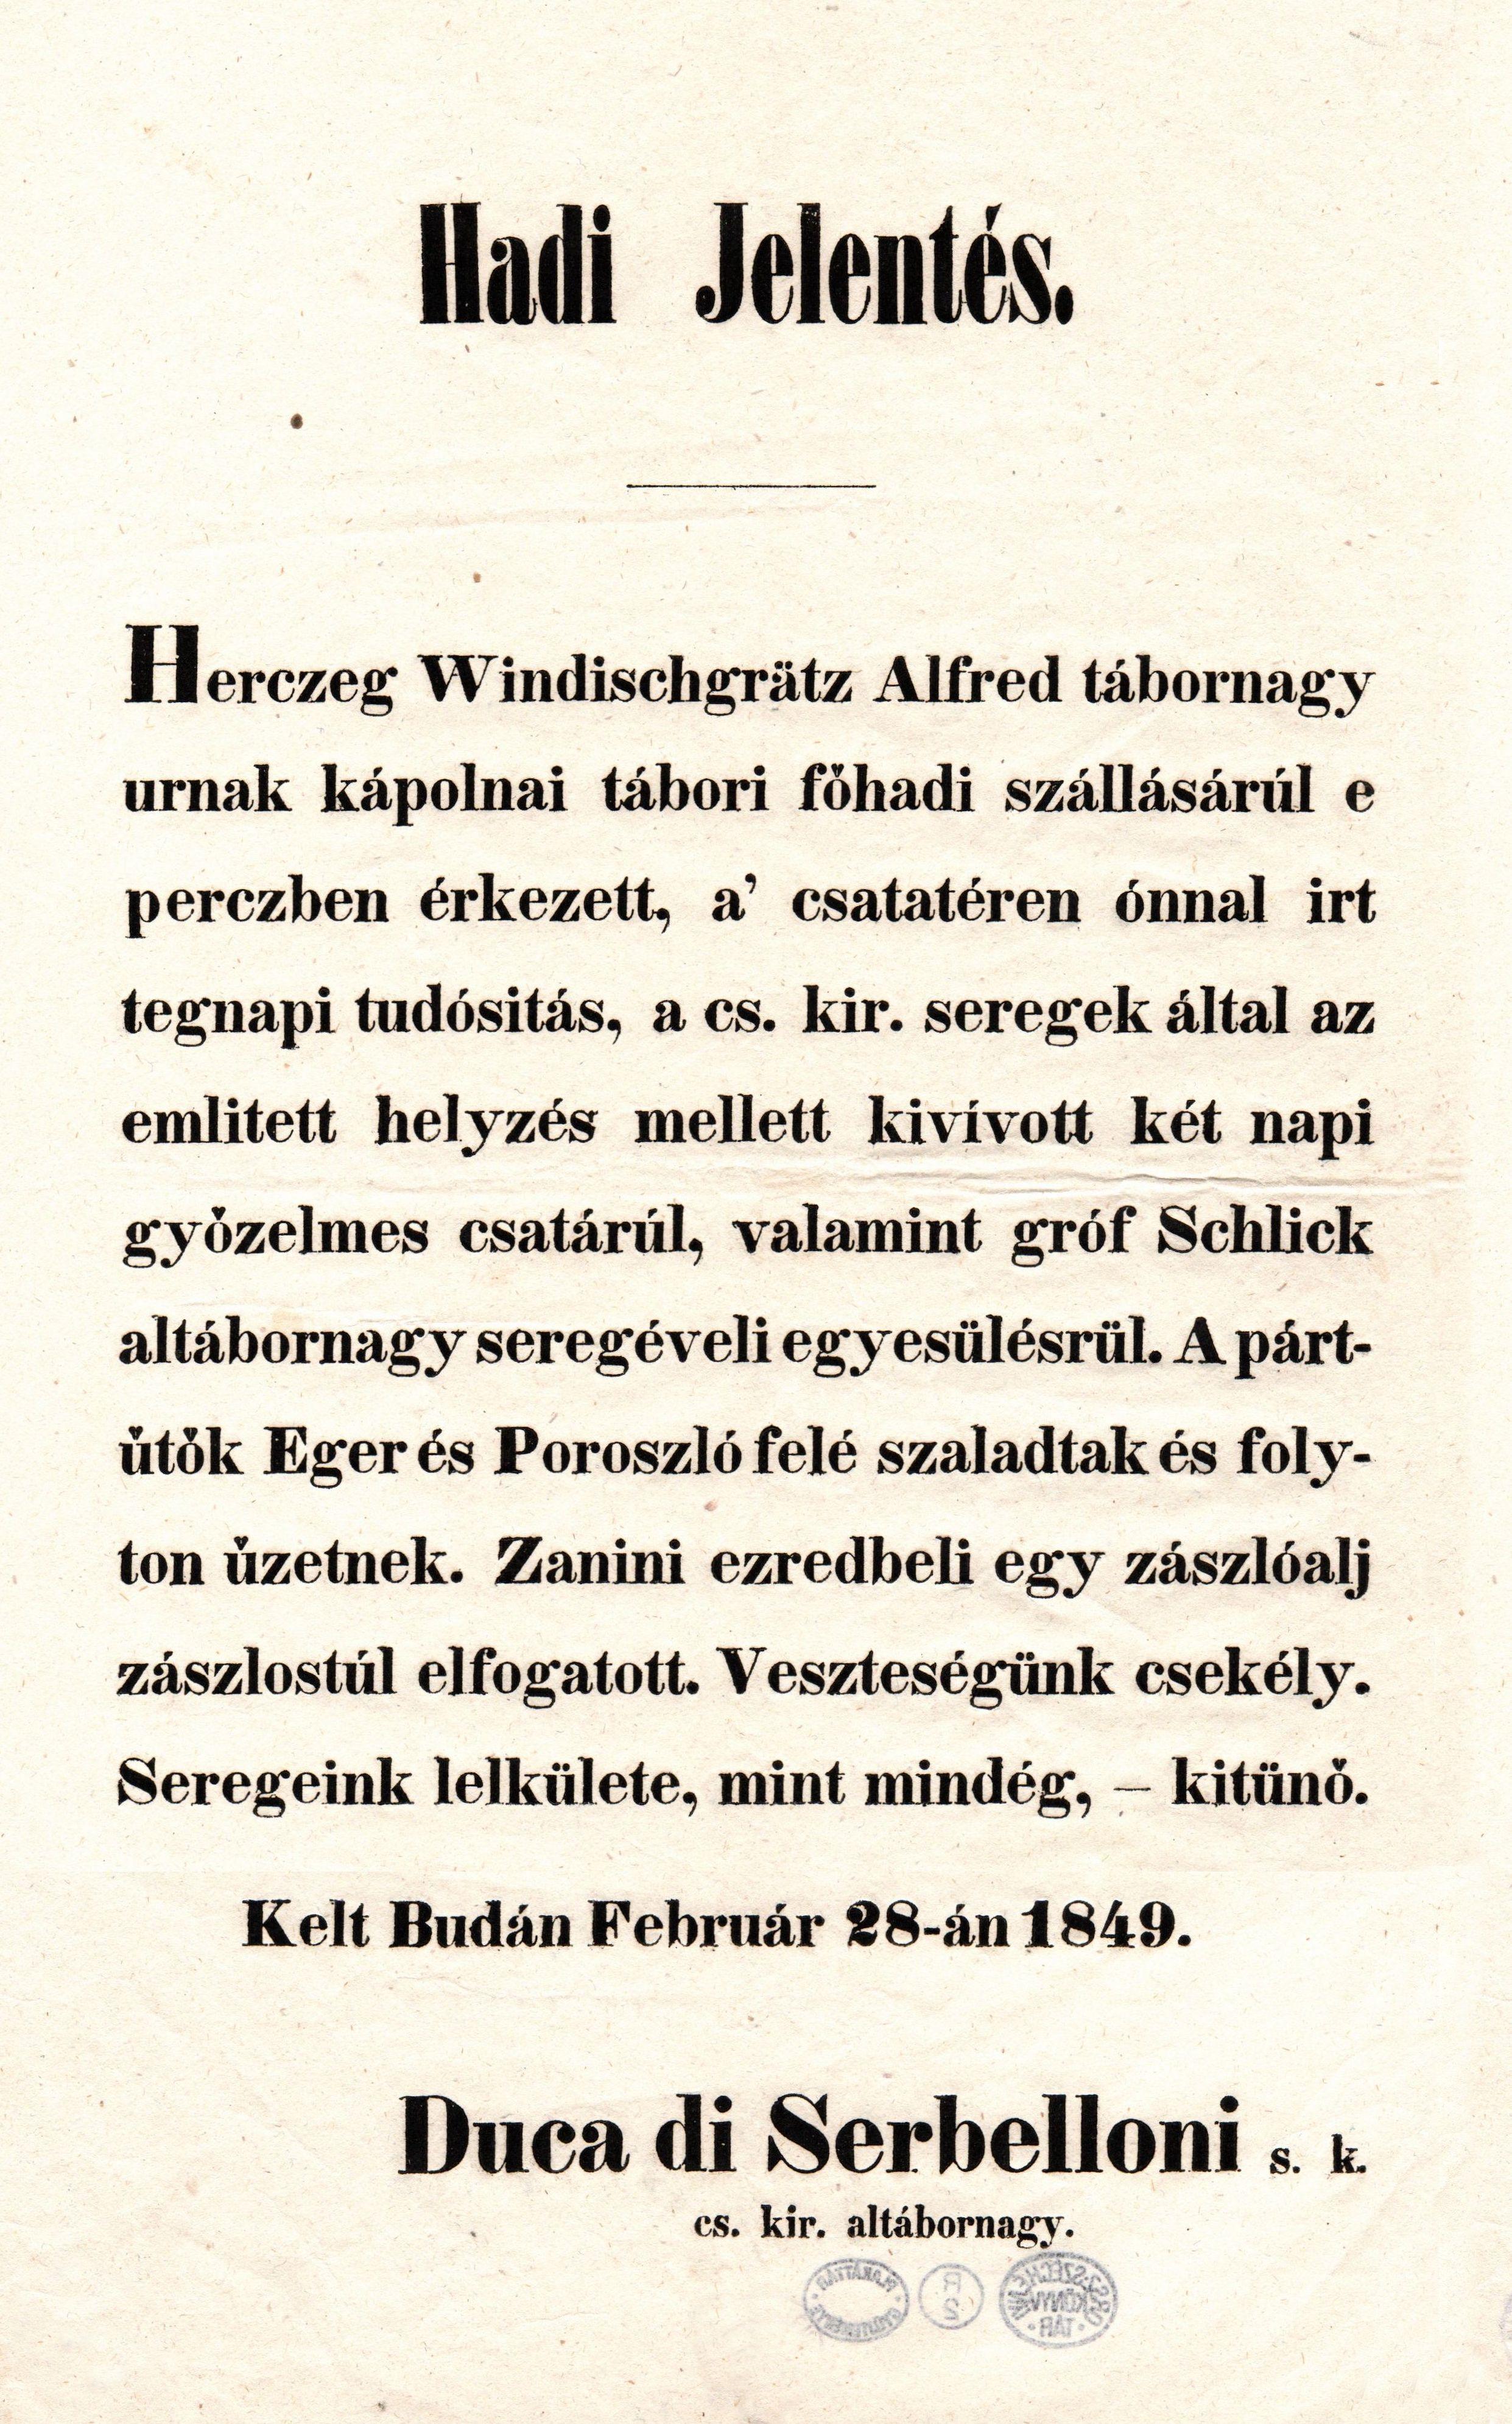 01_hadi_jelentes1849febr28_serbelloni_nemzetikonyvtar.jpg